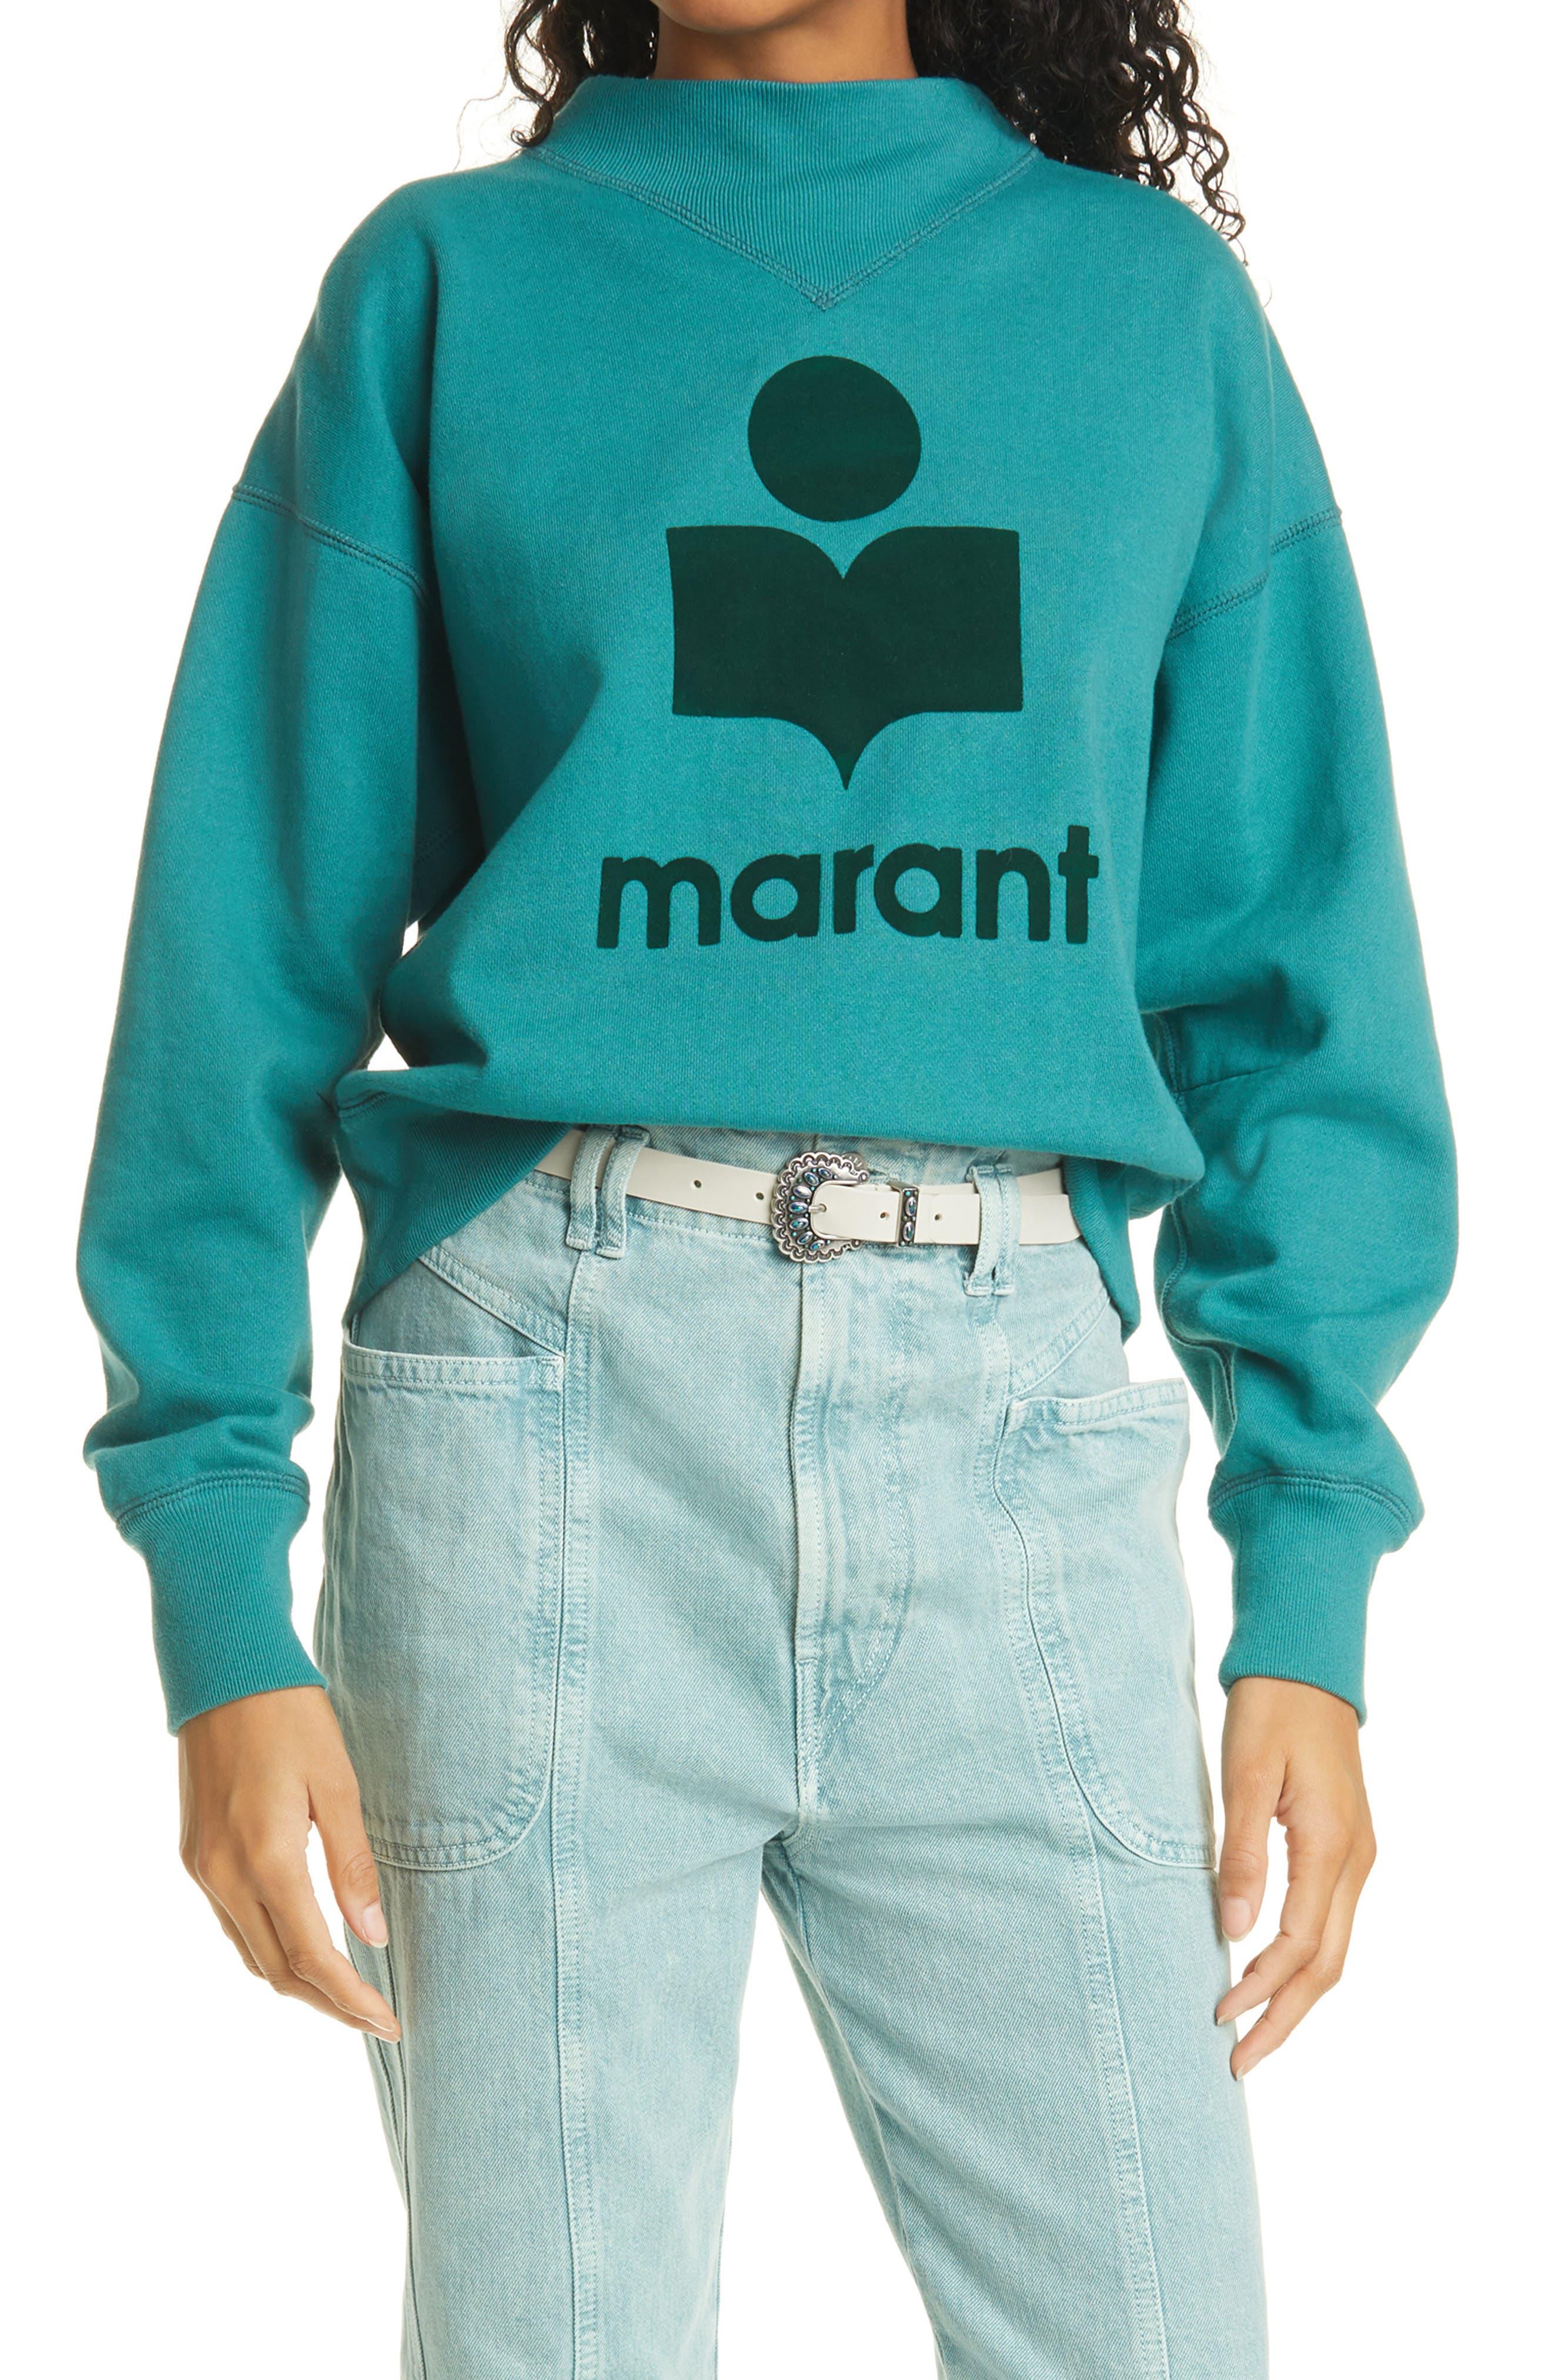 Women's Isabel Marant Graphic Sweatshirt